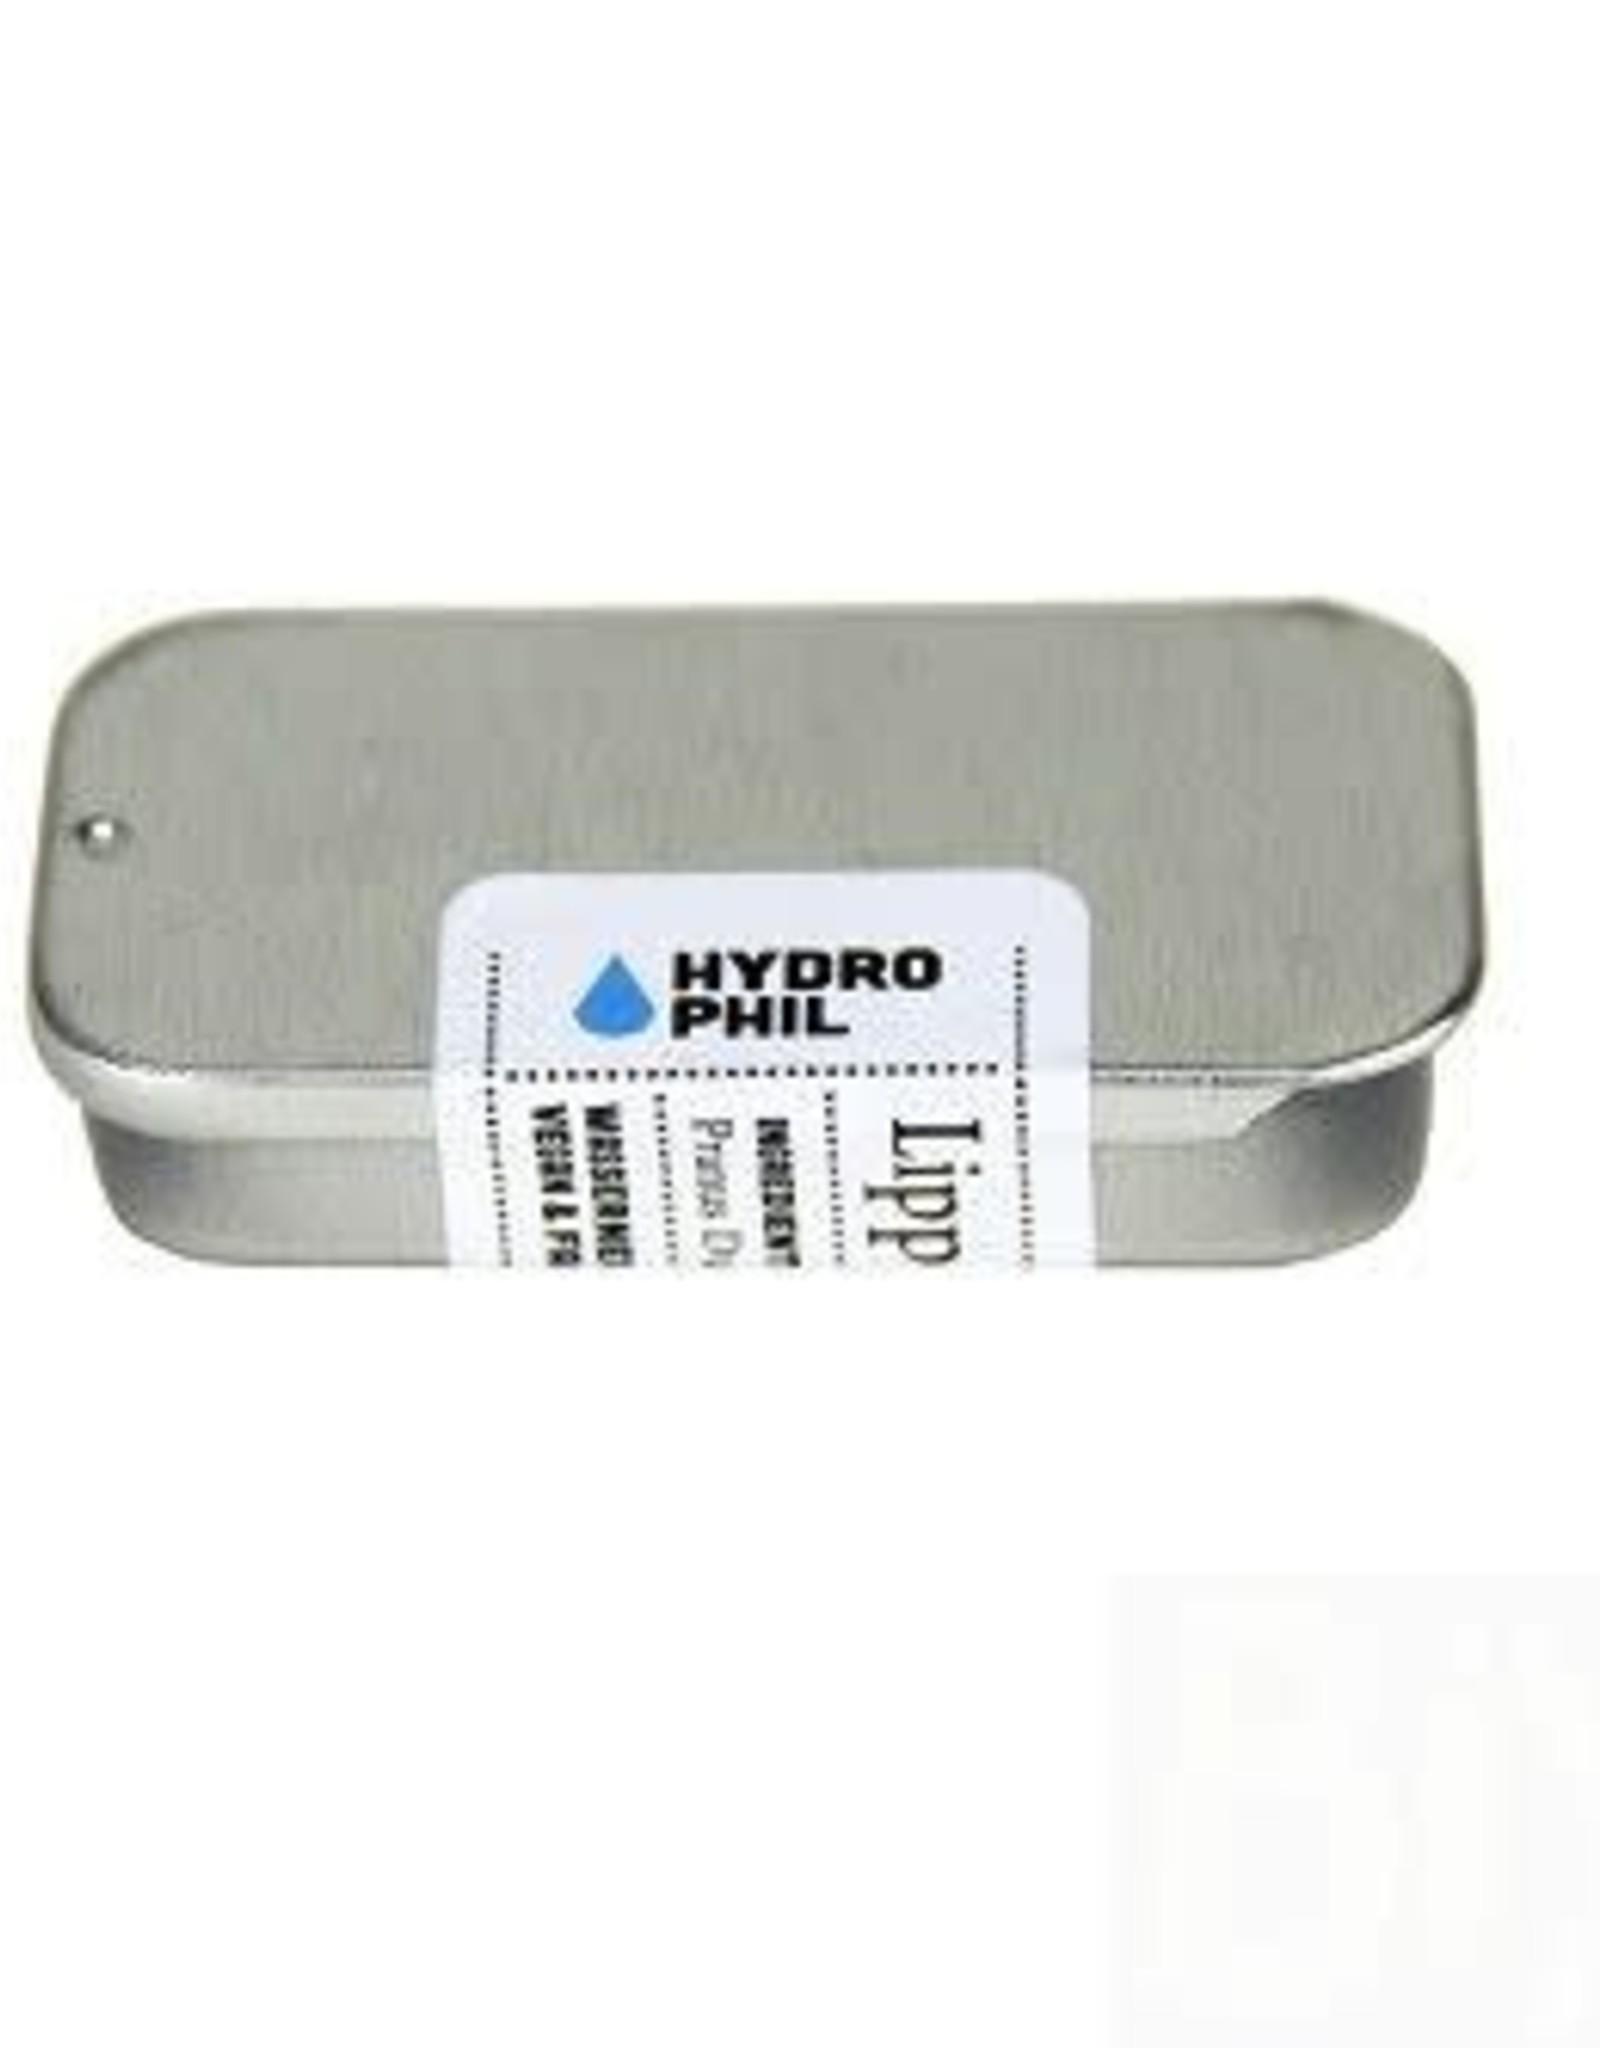 Hydrophil Hydrophil Lippenbalsem